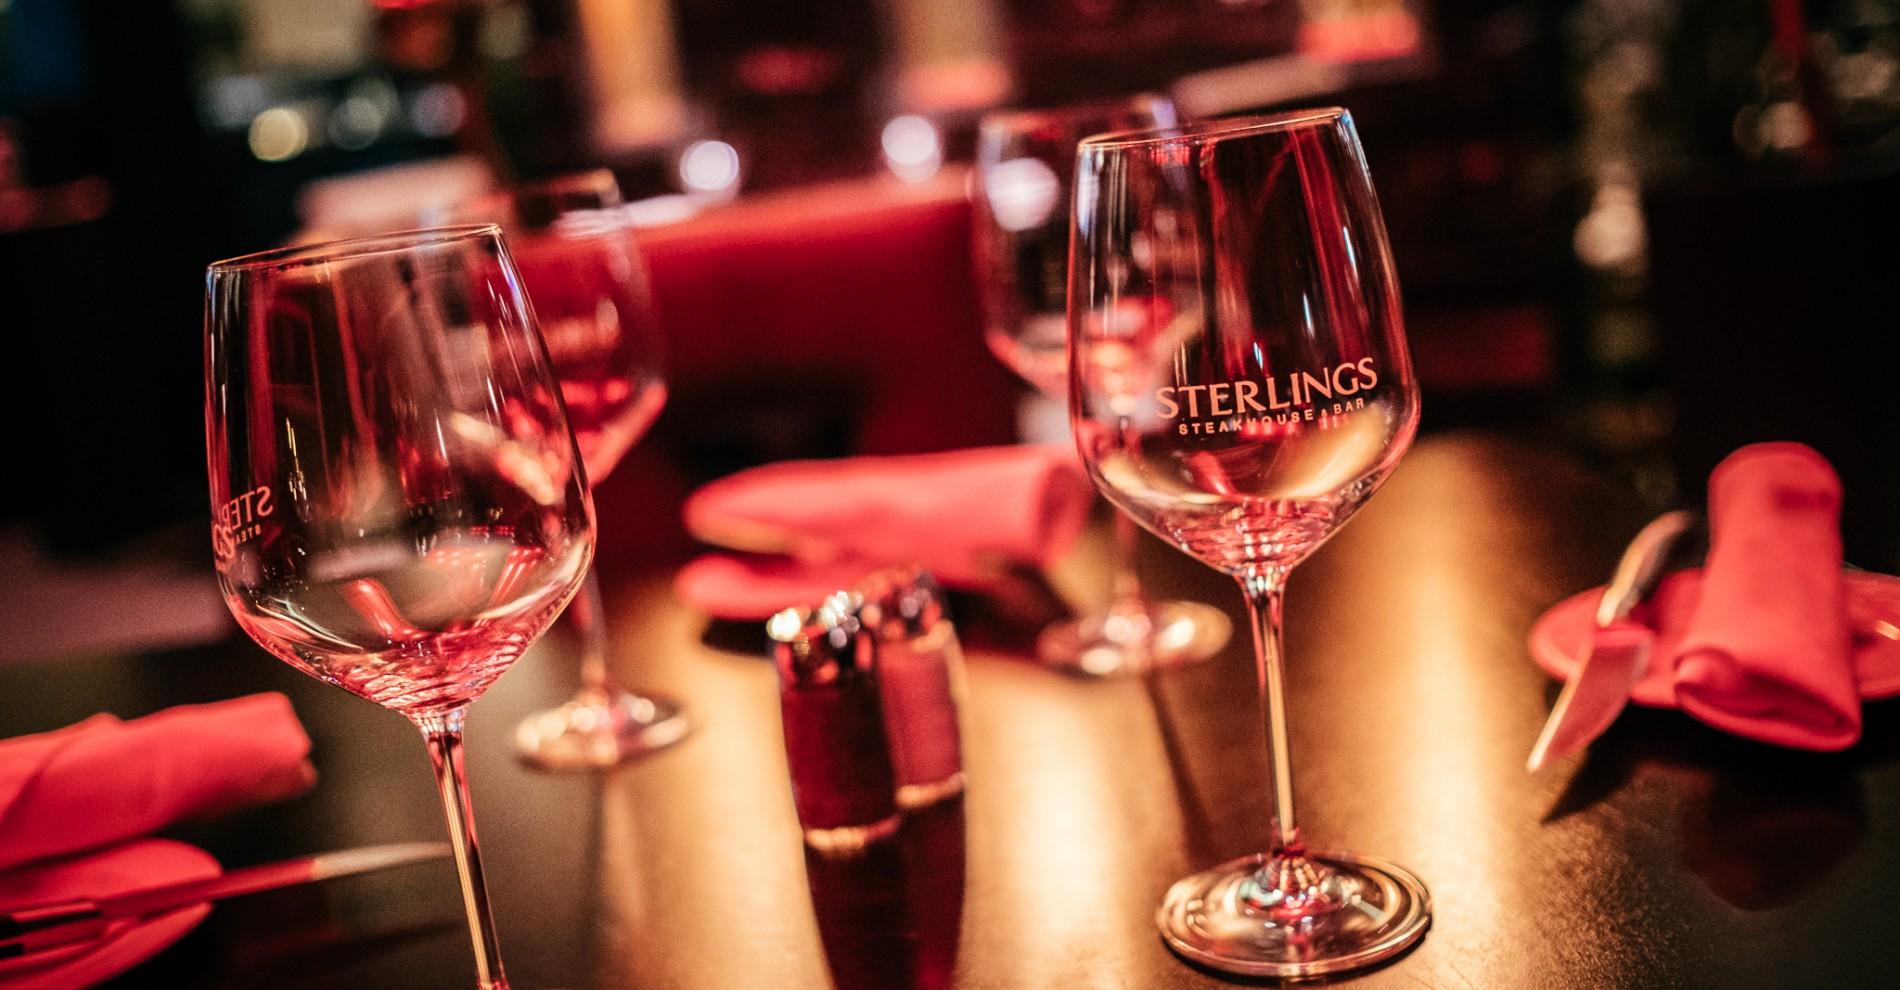 Evenement Sterlings Steakhouse 2018 123 Fr